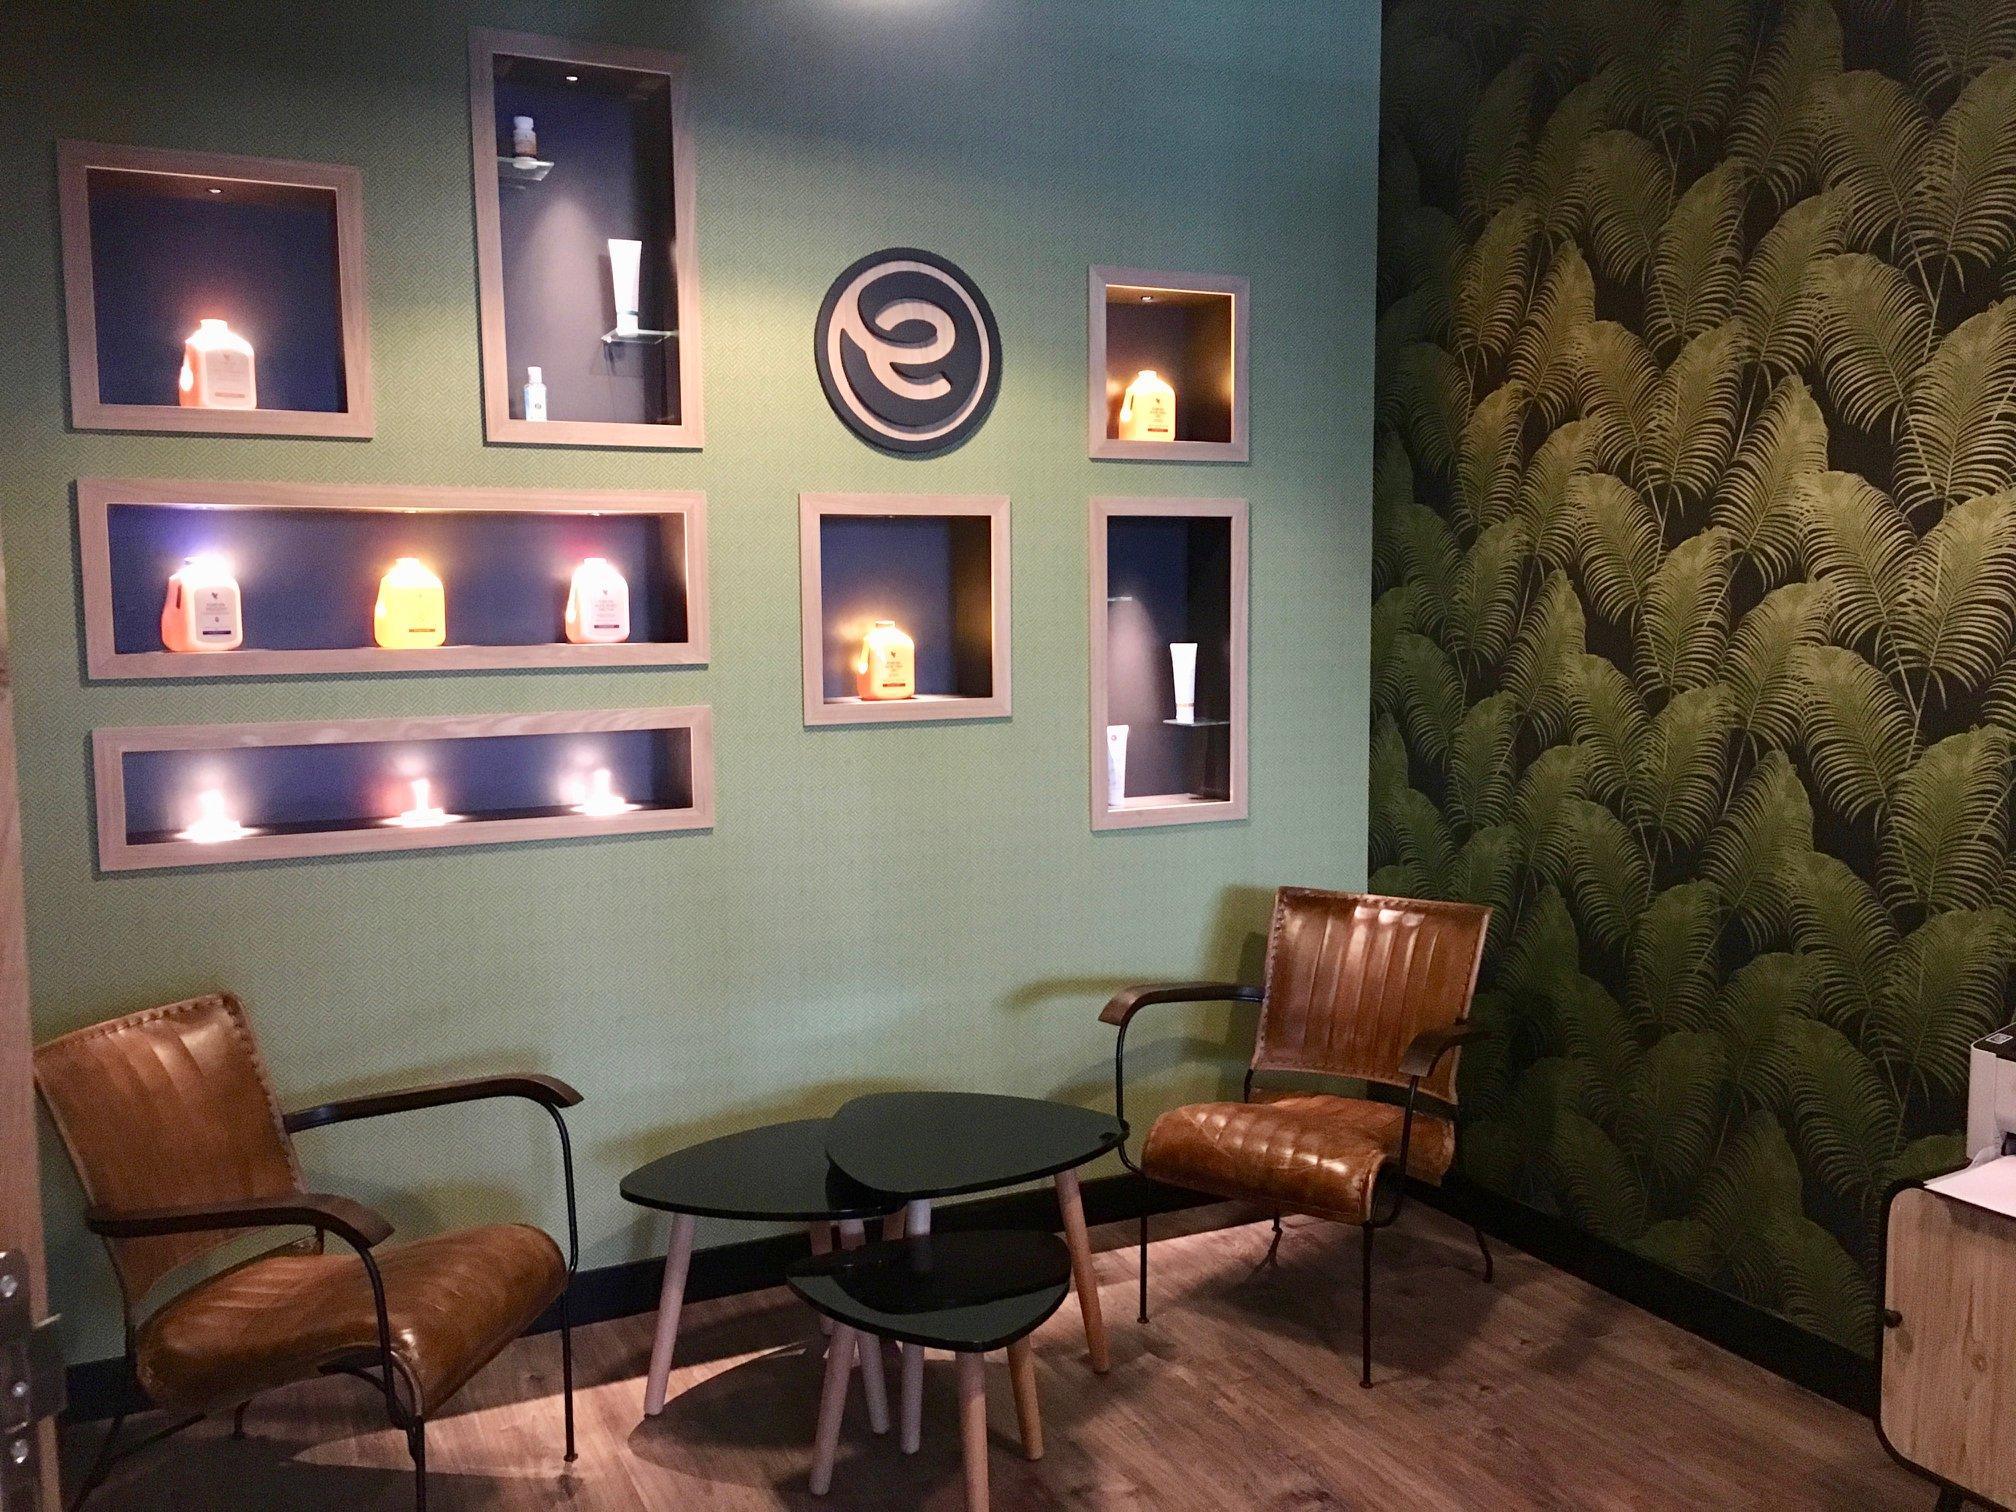 exlay club champagne au mont d 39 or salles de. Black Bedroom Furniture Sets. Home Design Ideas